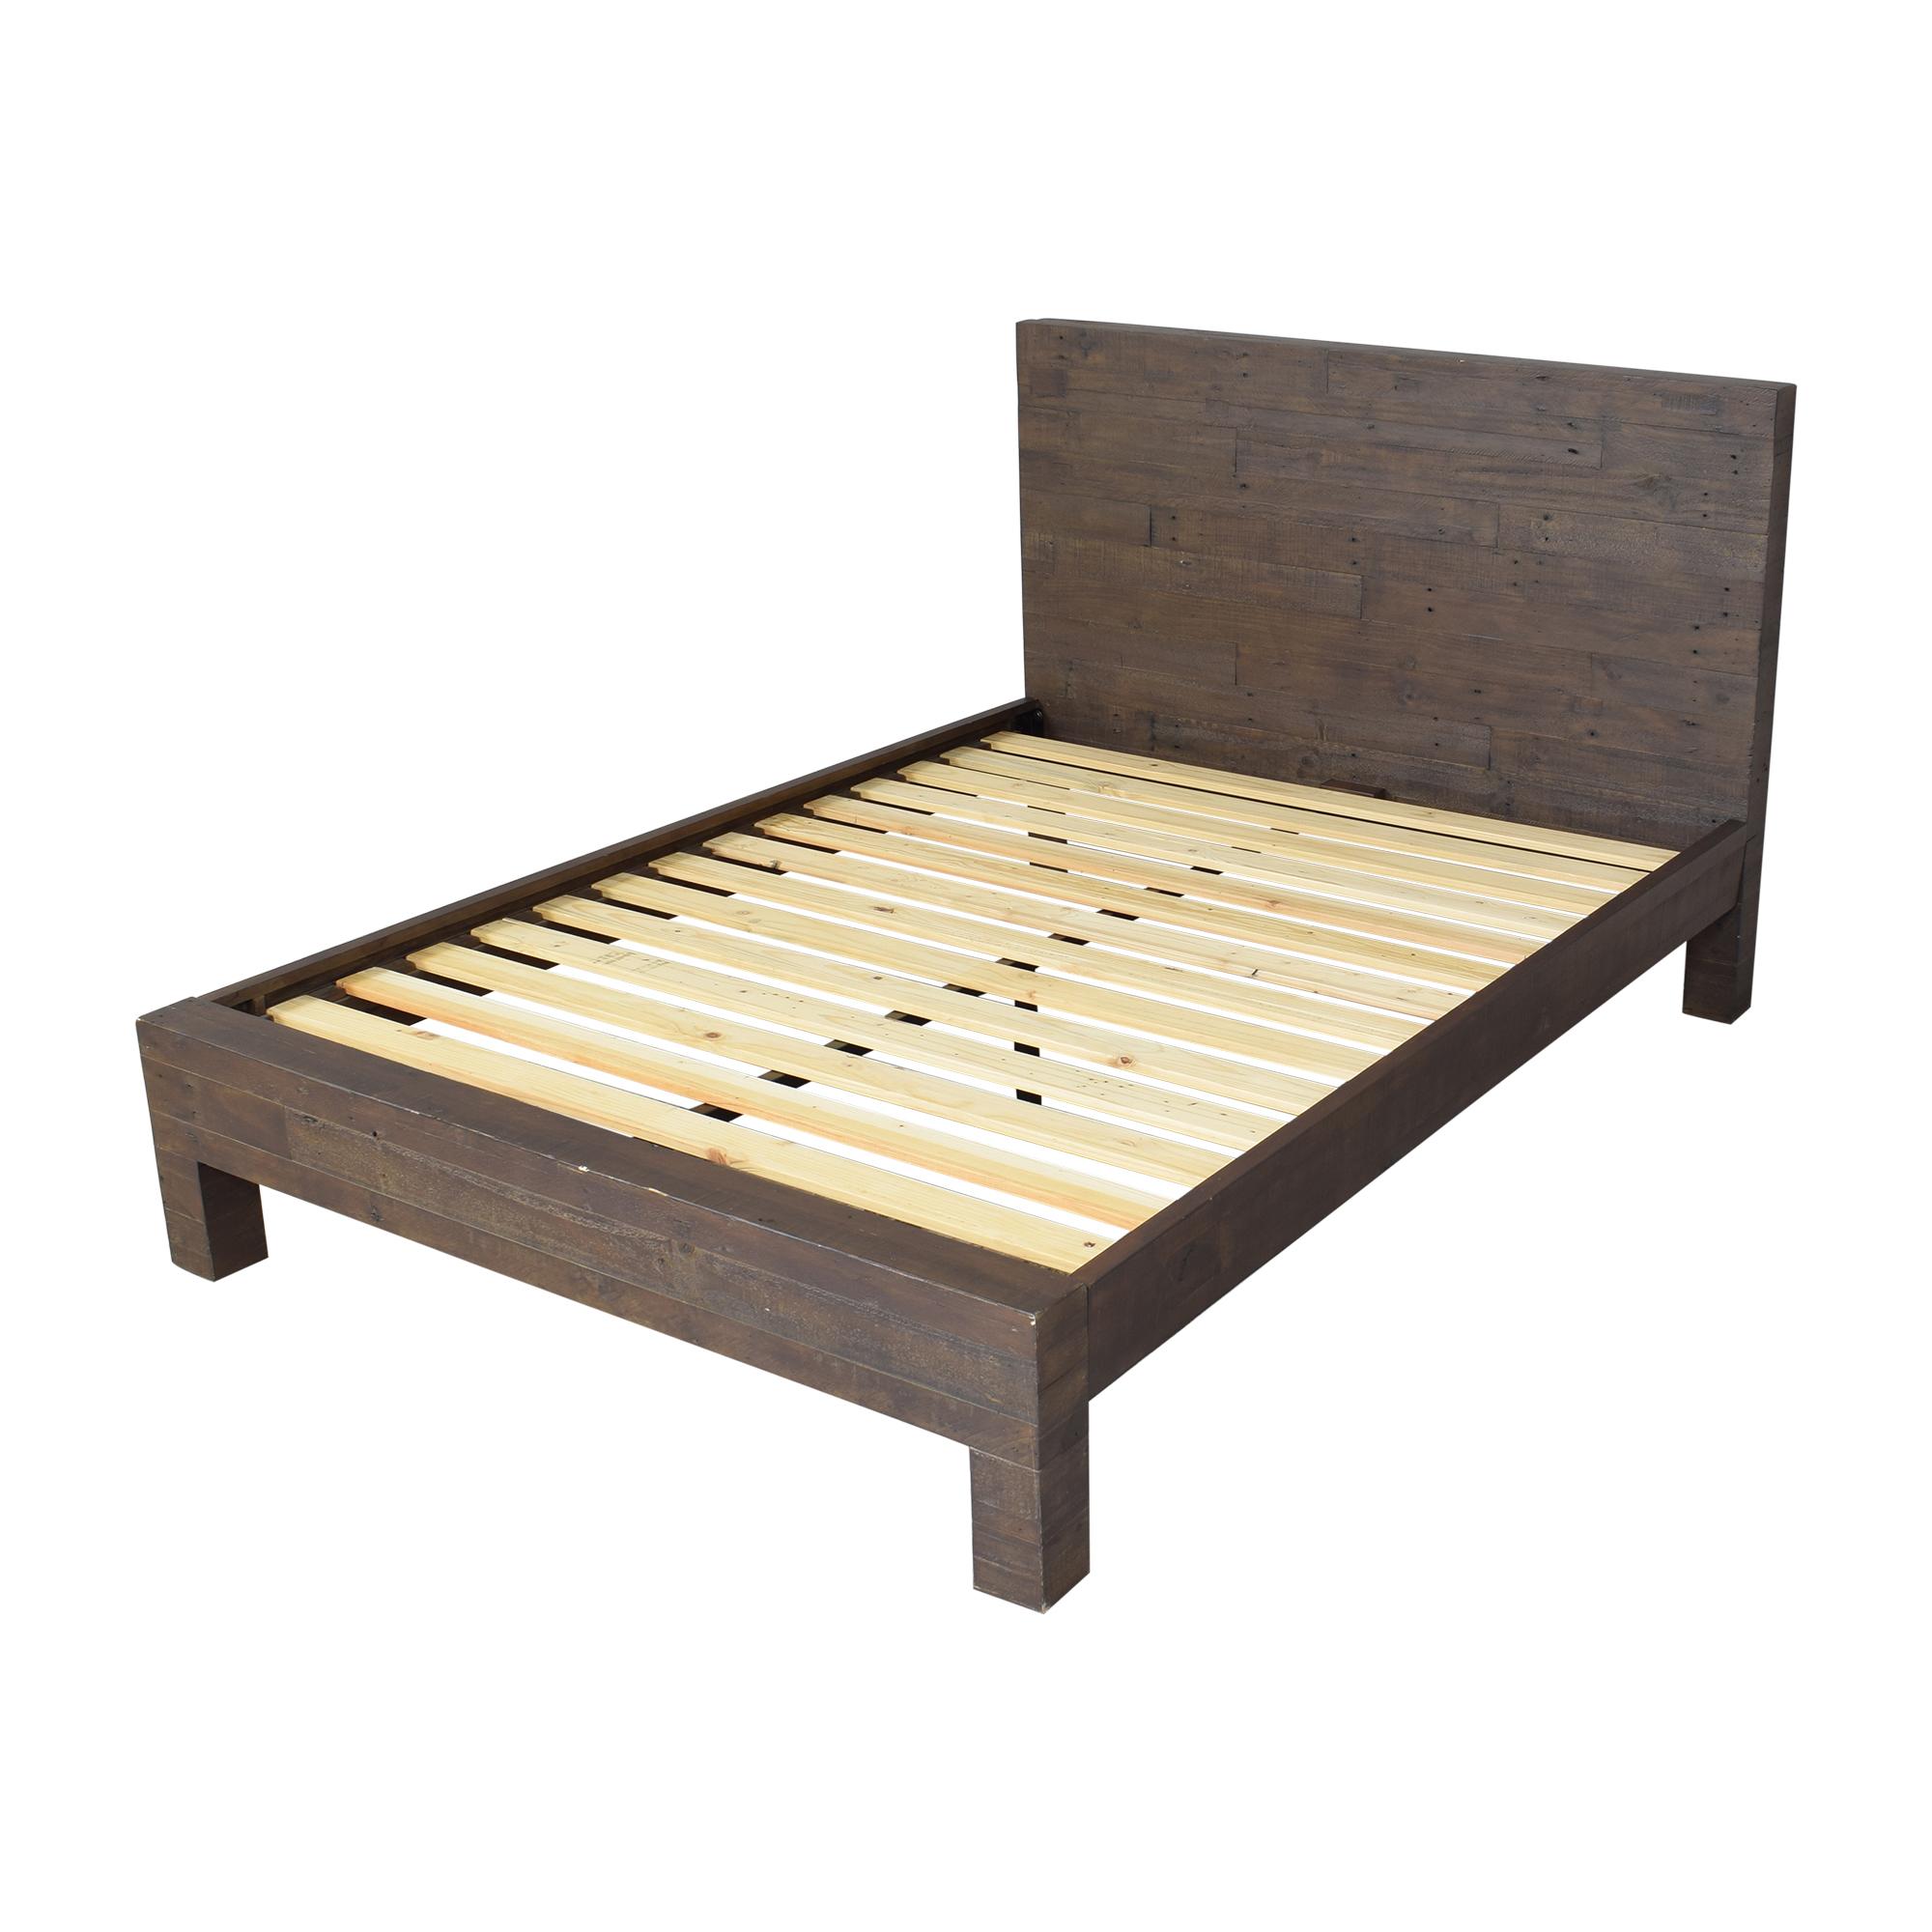 shop West Elm West Elm Emmerson Reclaimed Queen Bed online